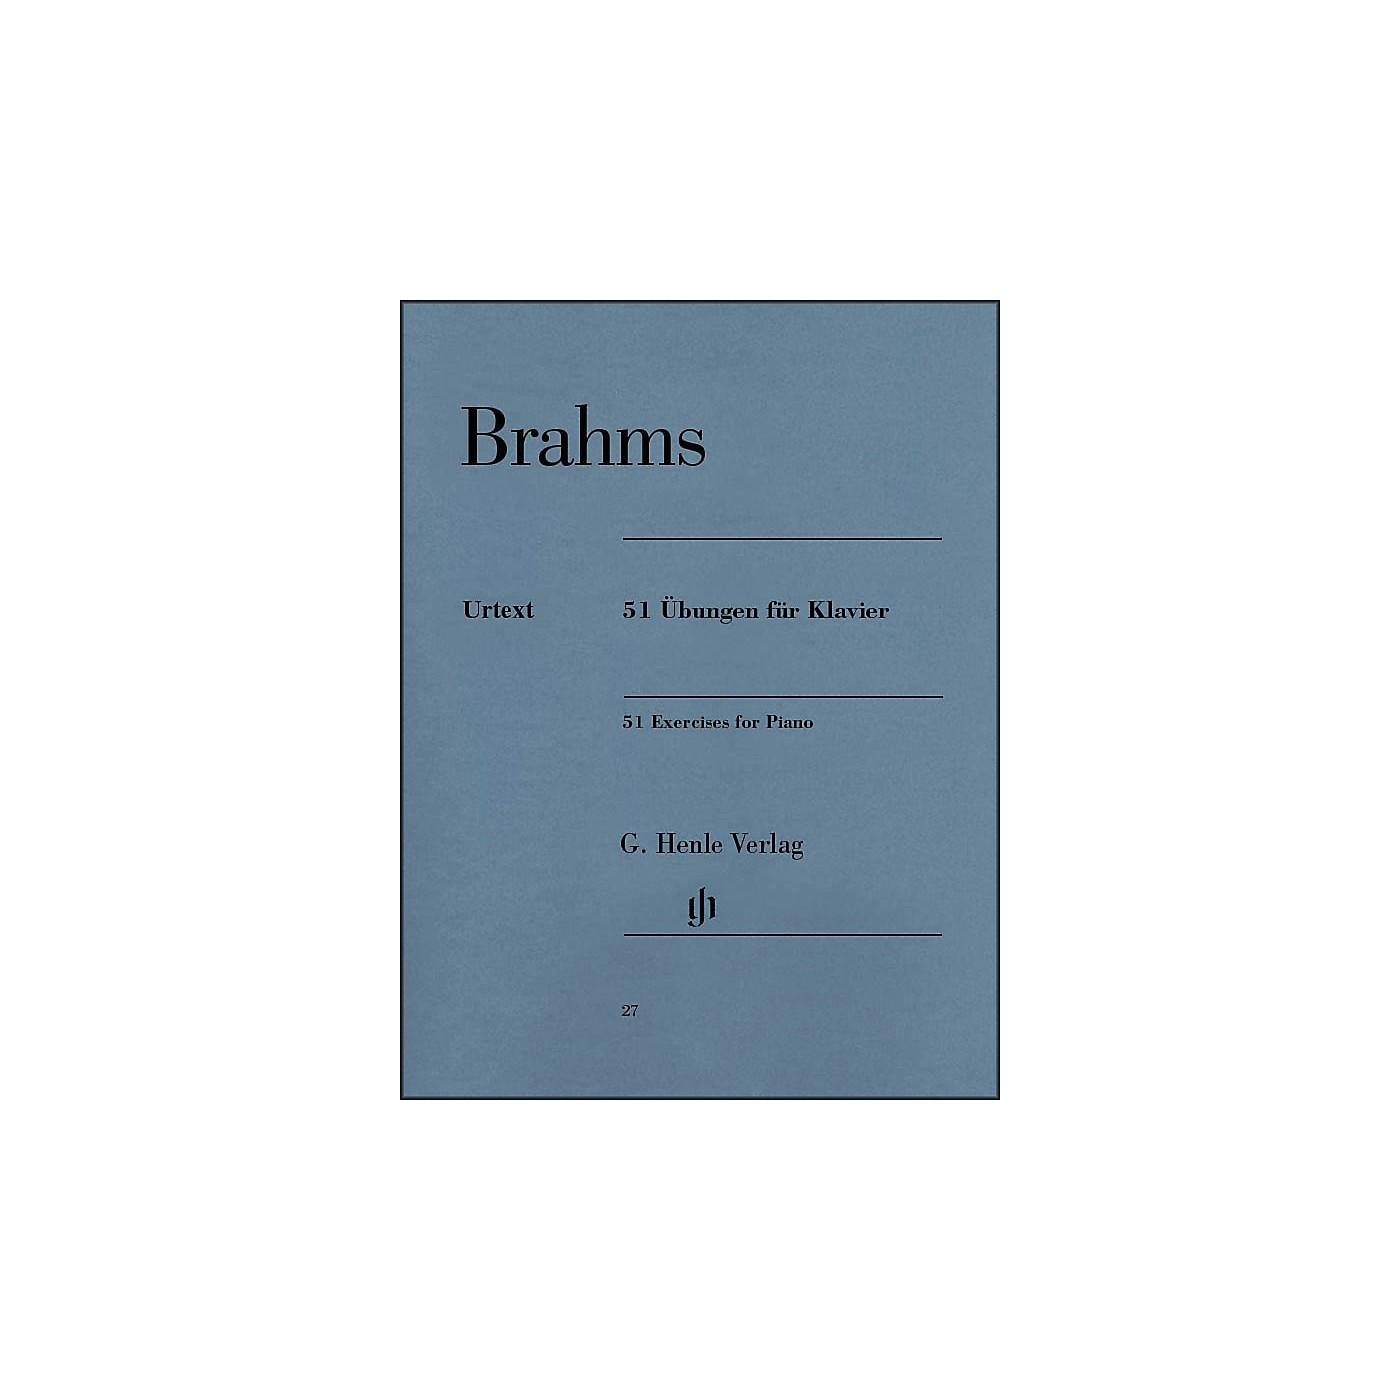 G. Henle Verlag 51 Exercises for Piano By Brahms thumbnail